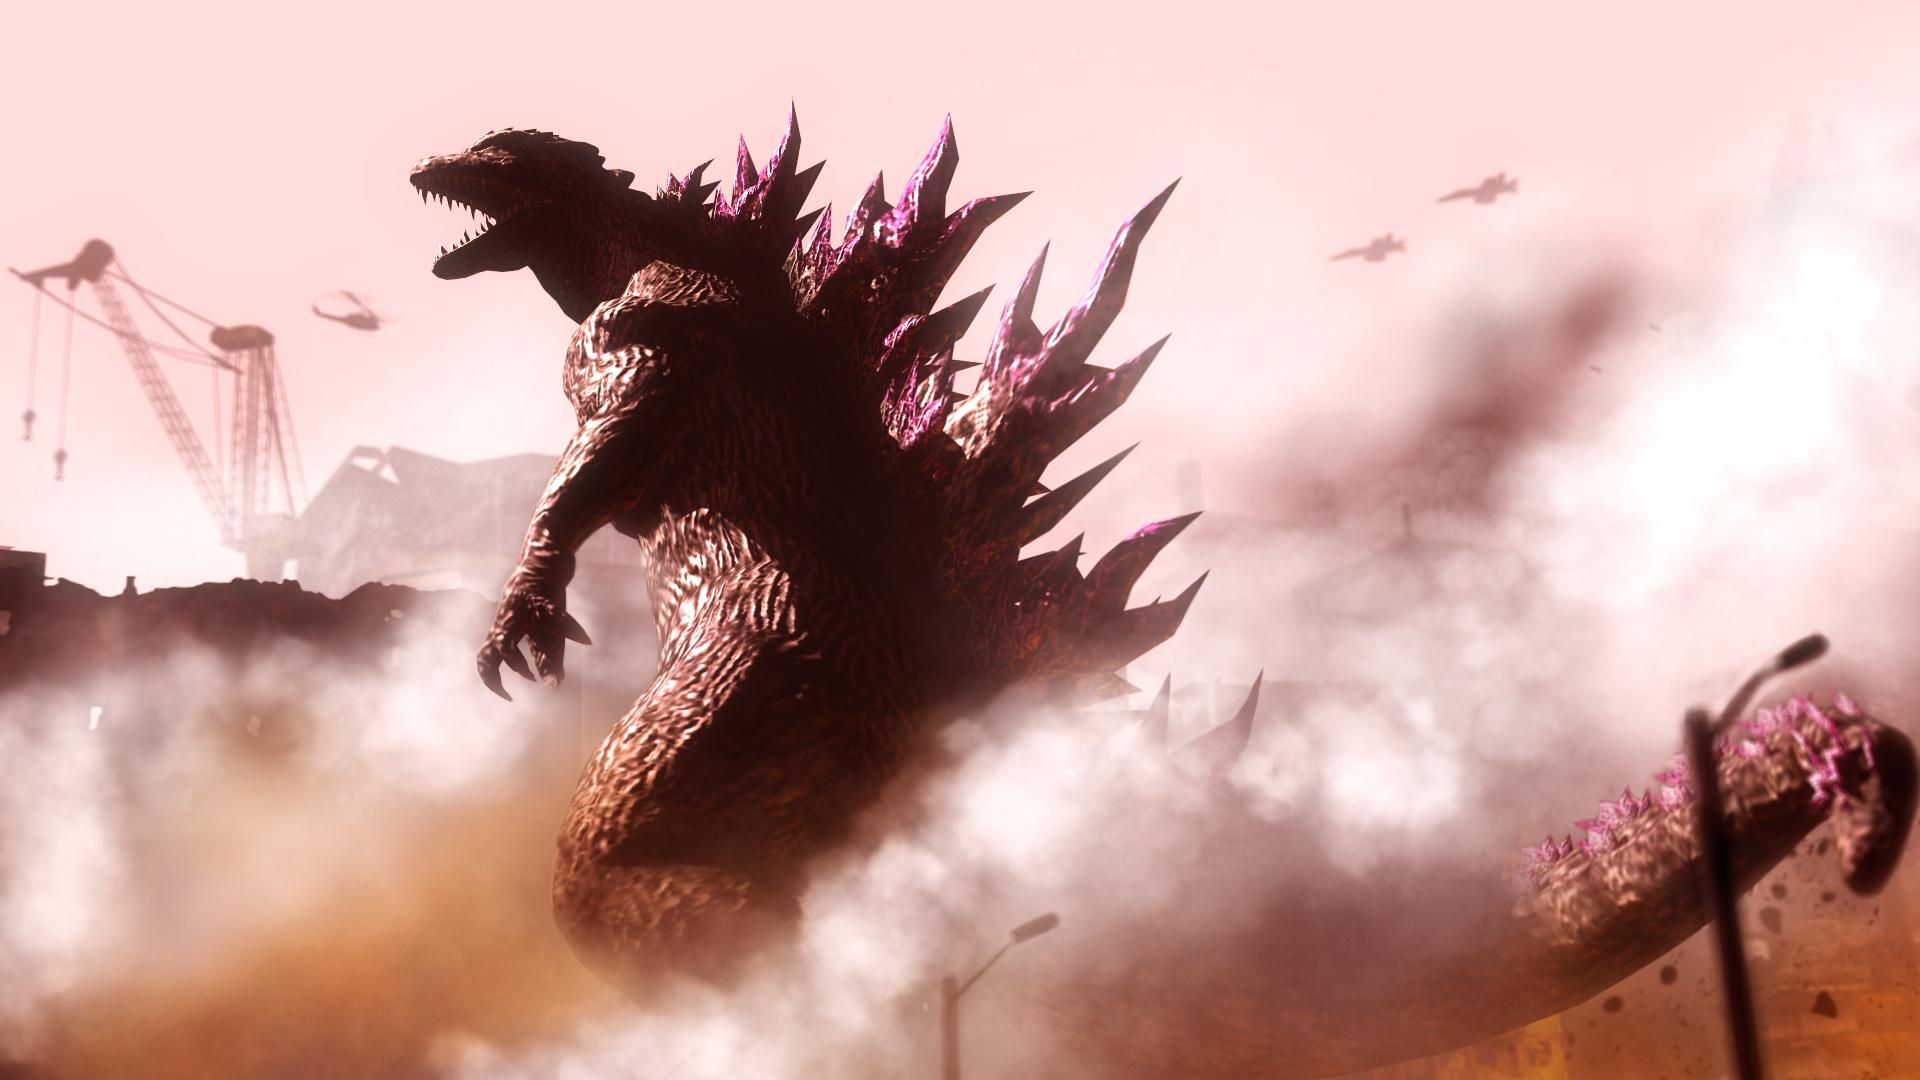 Godzilla Wallpaper Screensavers